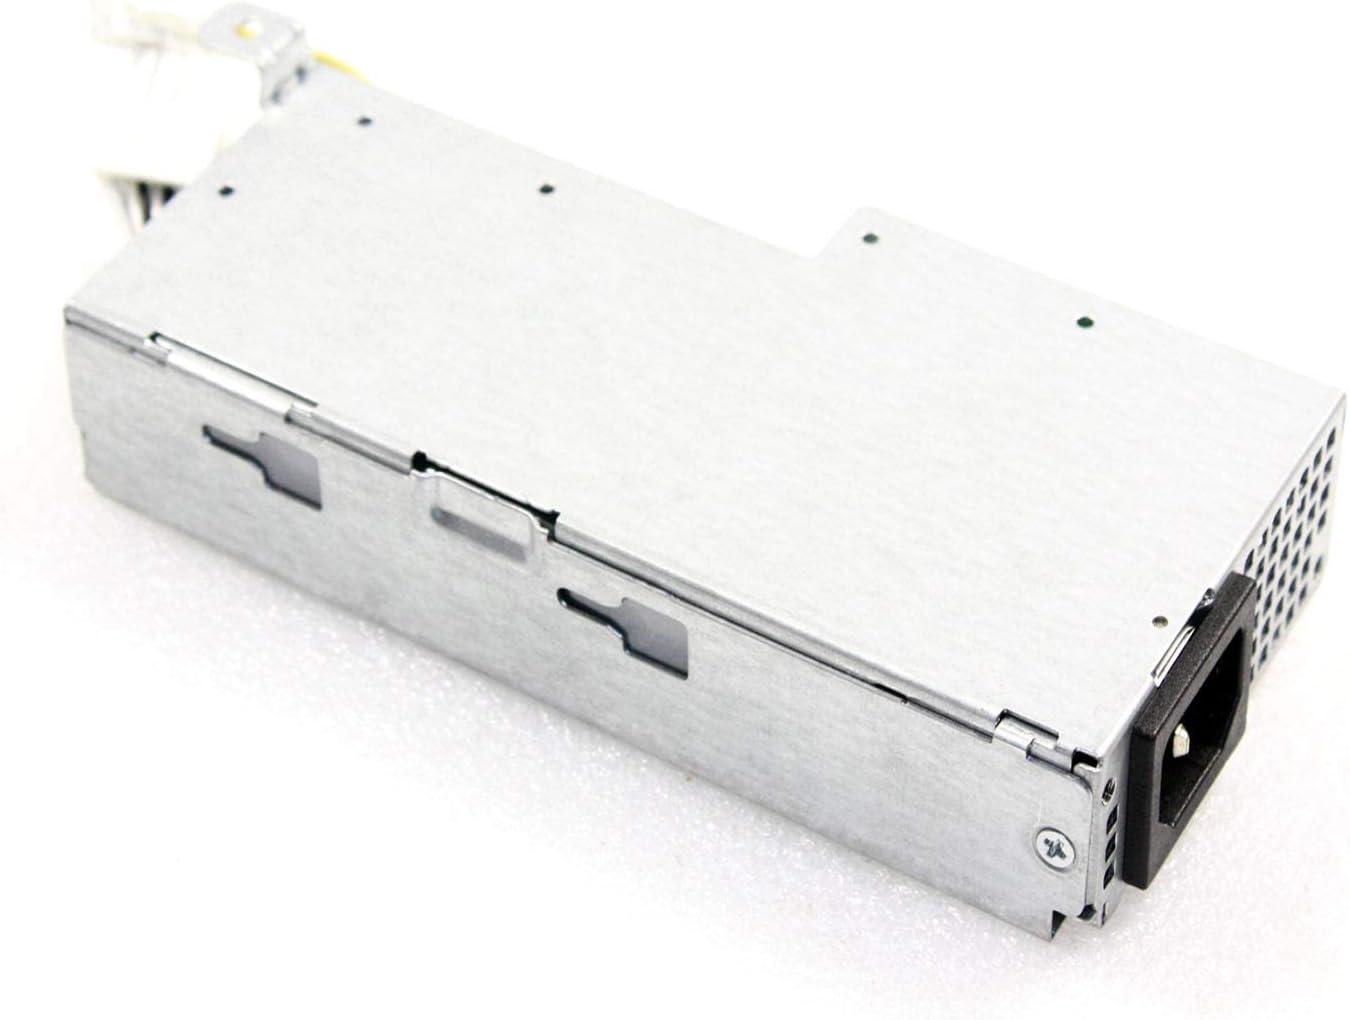 M178R PSU 180W Switching Flextronics F180EU-00 Optiplex 780 Slim Tower